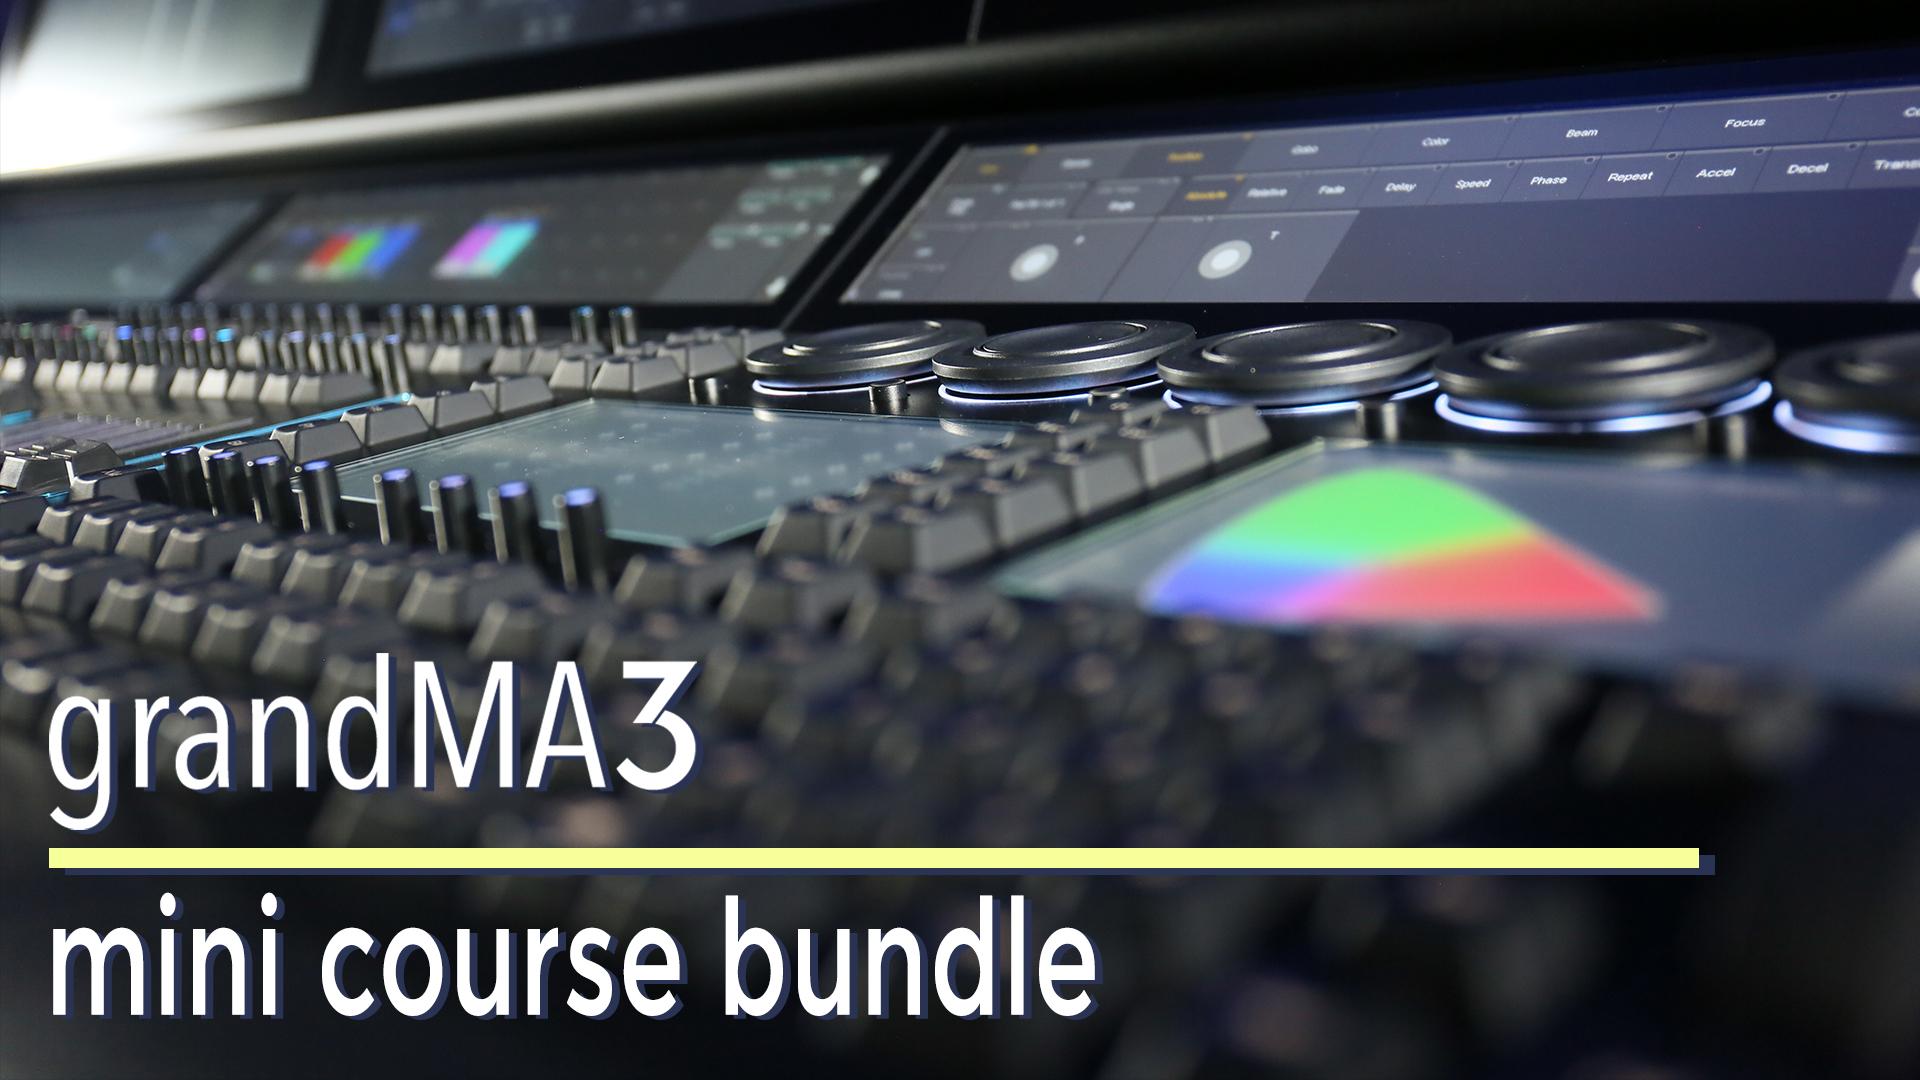 grandMA3 mini-course bundle